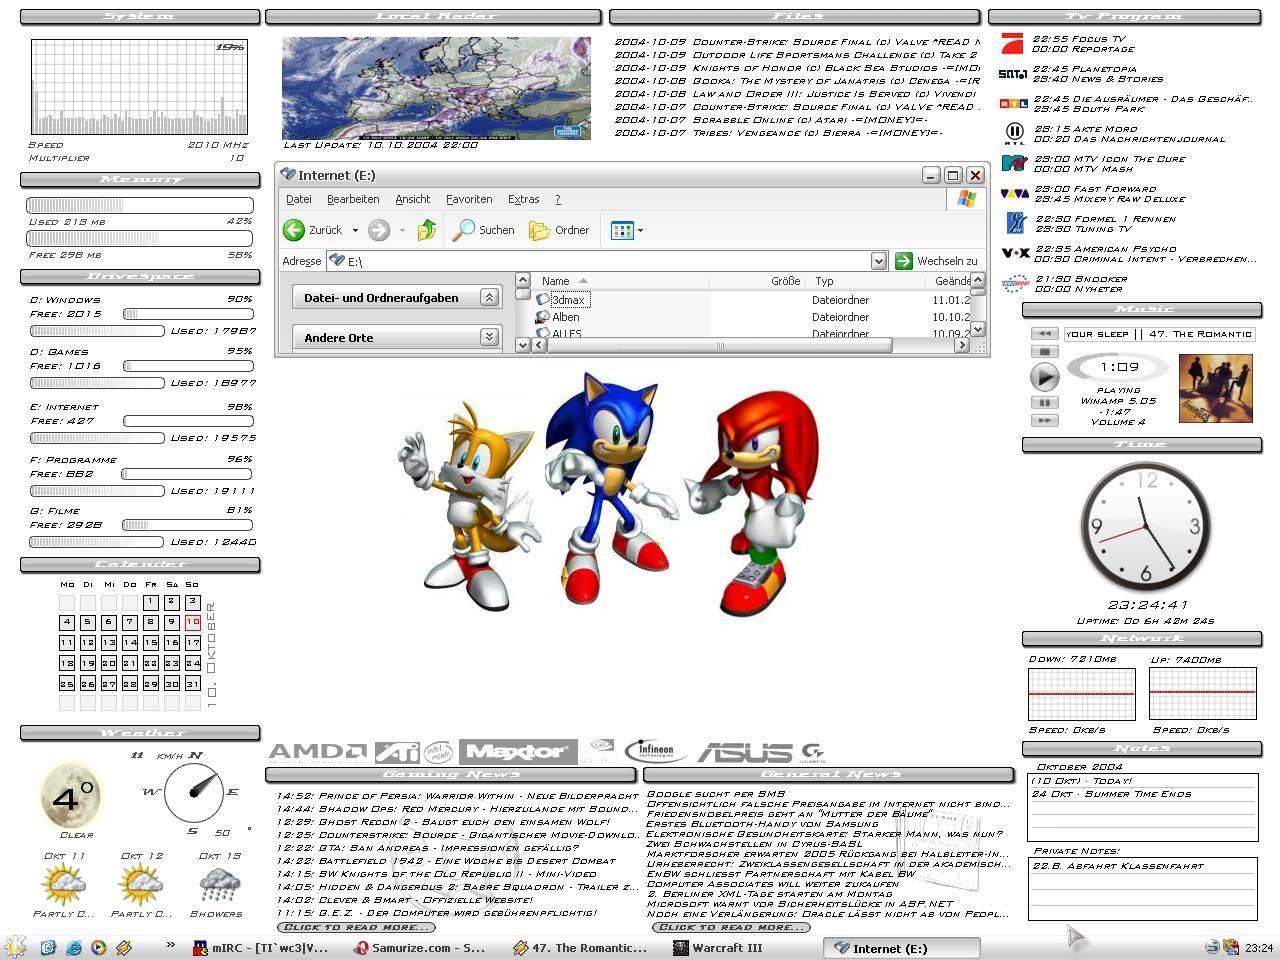 Title: Do u know Sonic?